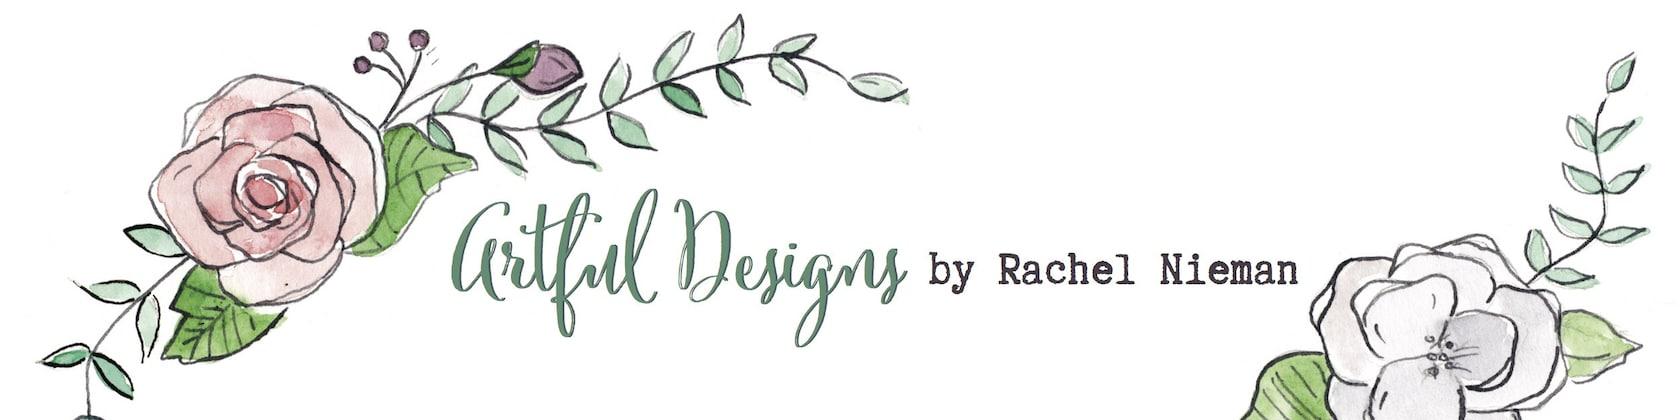 Stationery artwork design calligraphy jewelry by artbynieman